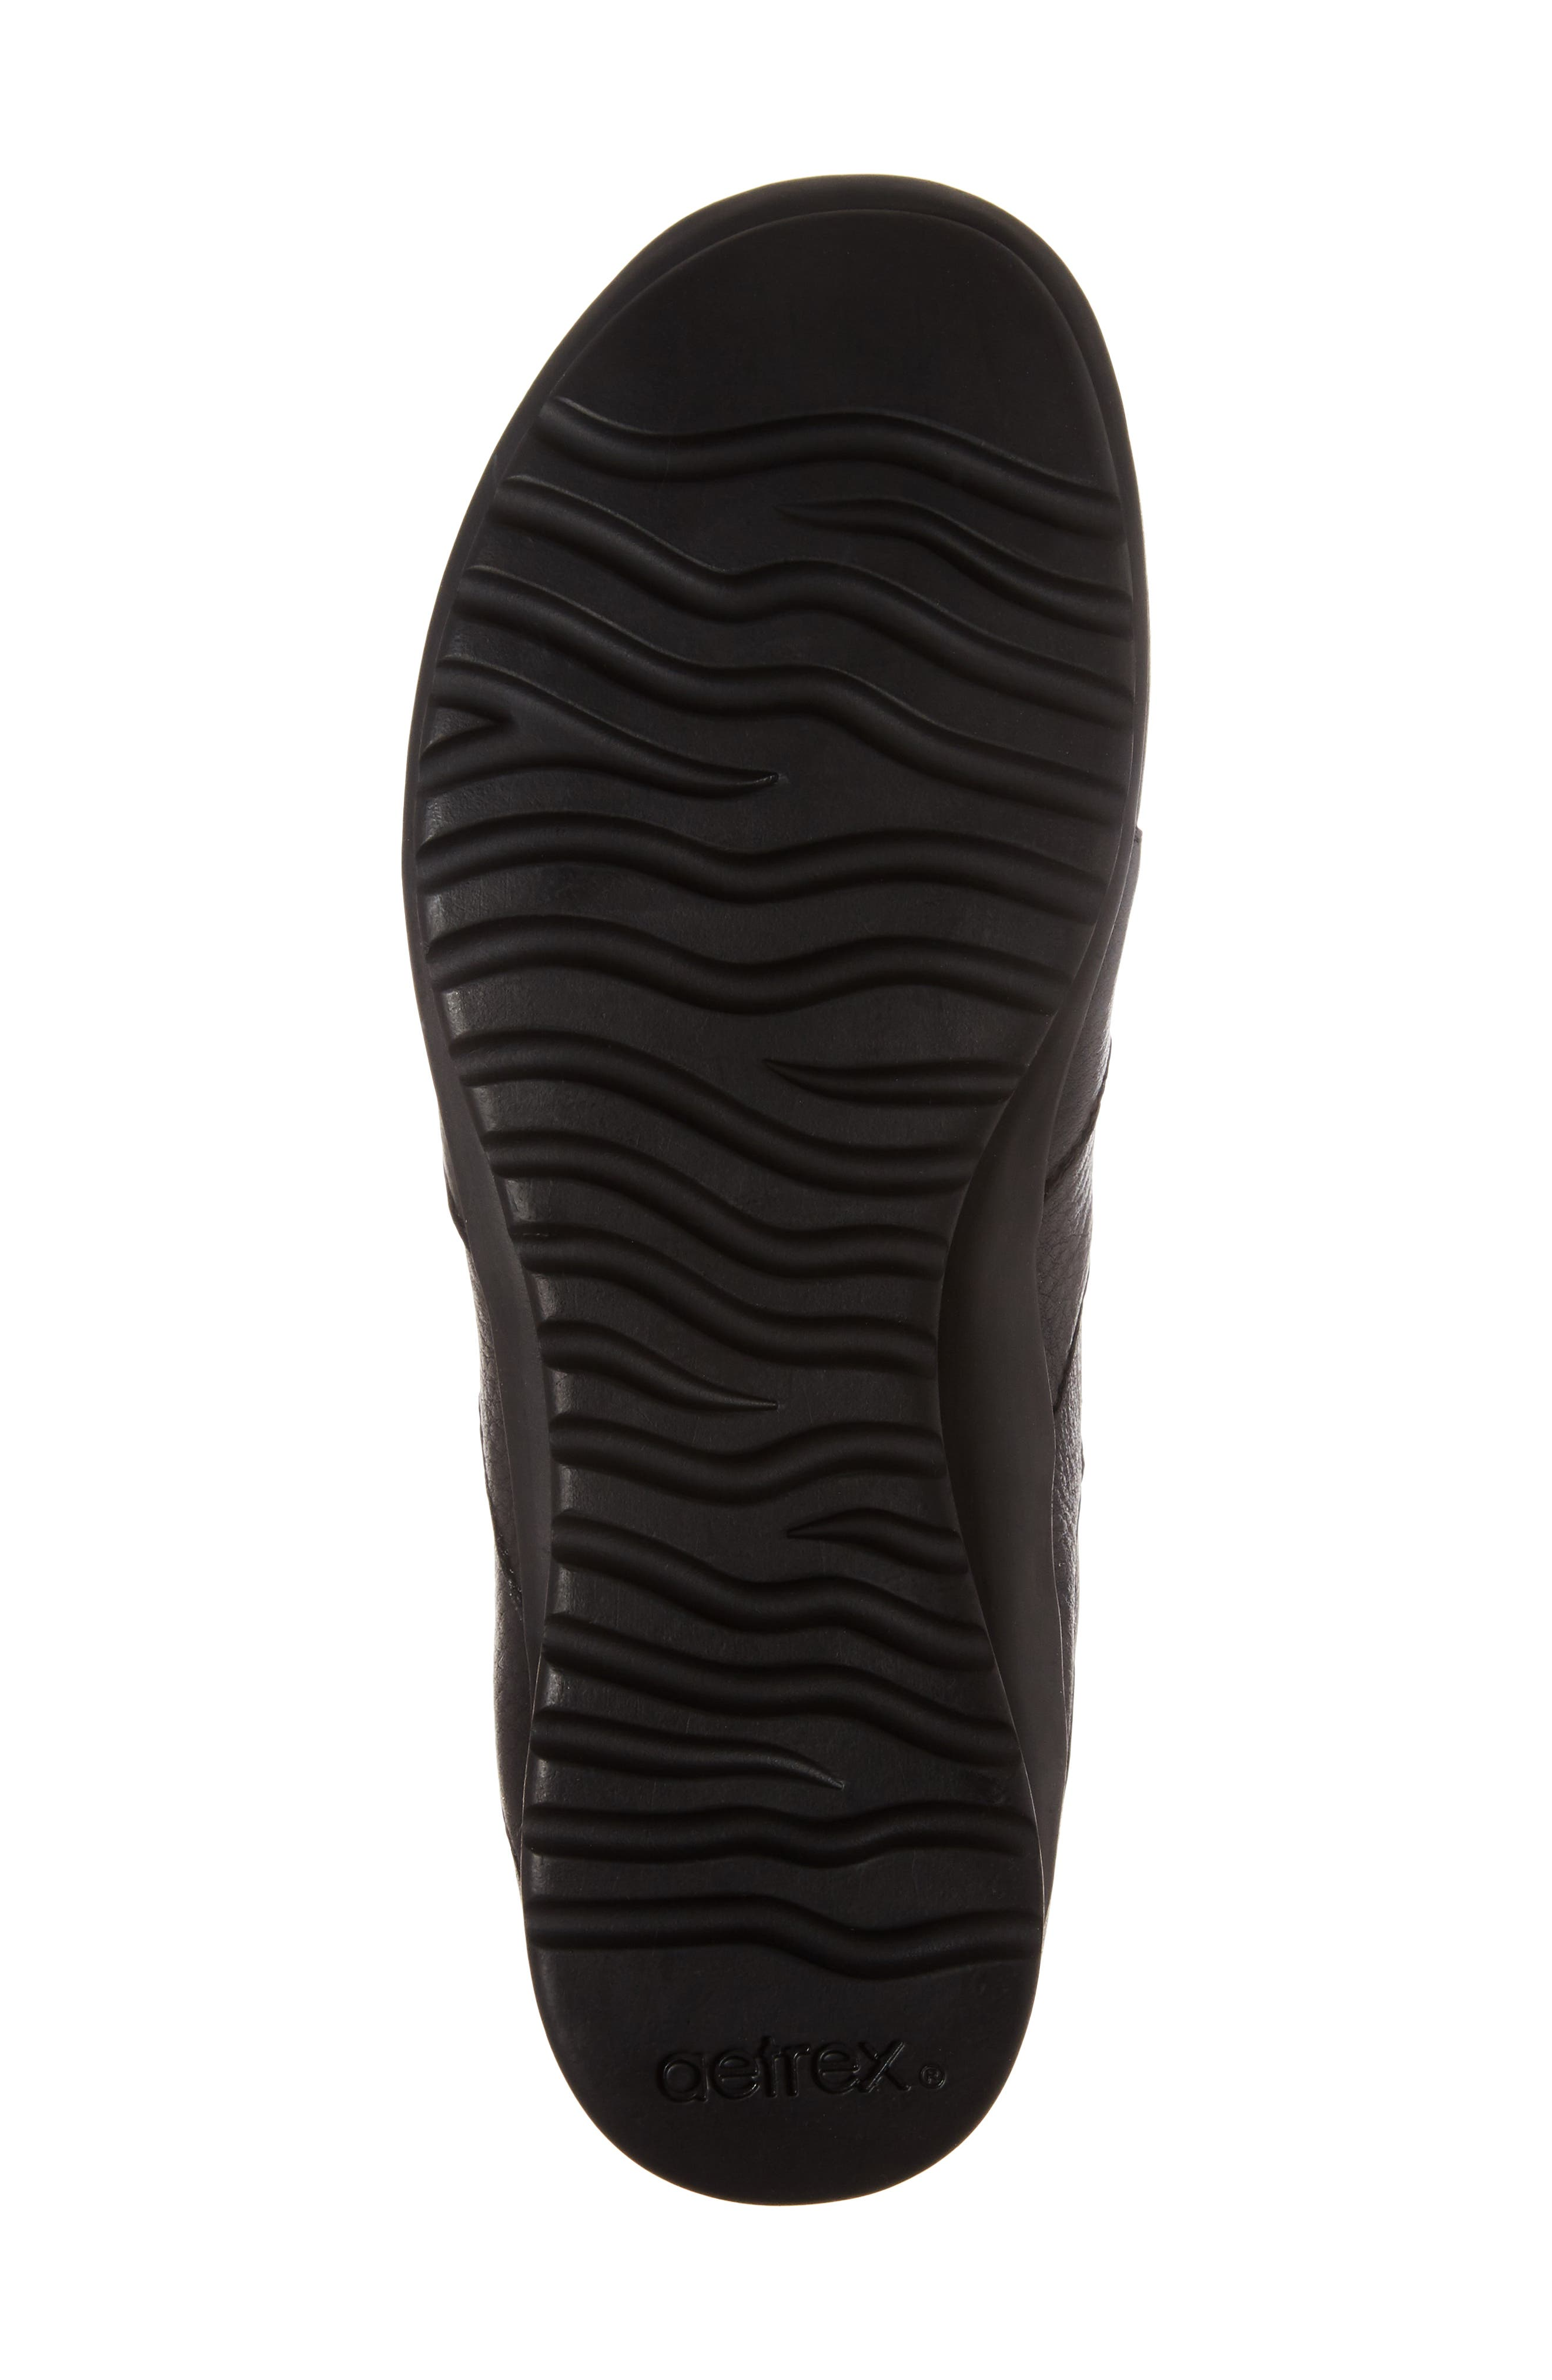 AETREX, Sienna Cutout Sneaker, Alternate thumbnail 6, color, BLACK LEATHER/ BLACK